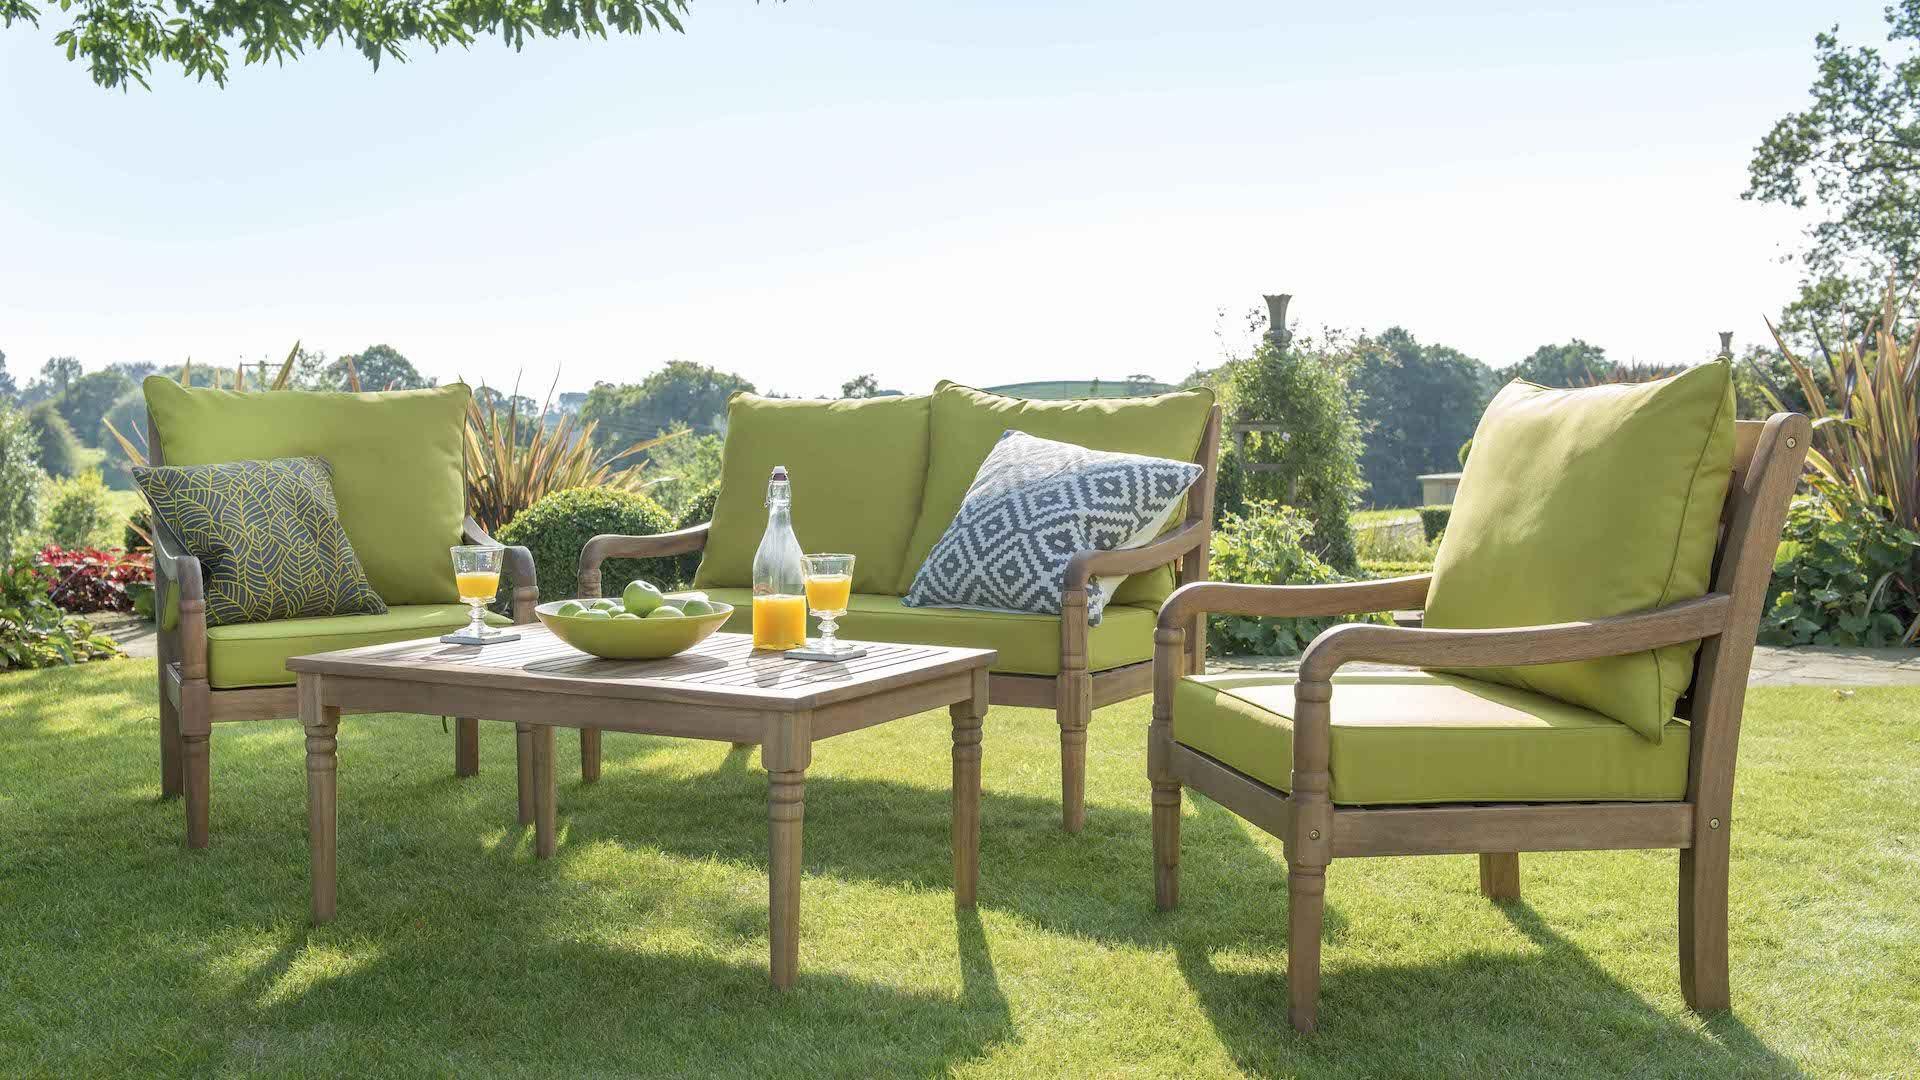 wooden garden chairs uk stool chair pronunciation cleobury lounge set wood furniture hartman outdoor products